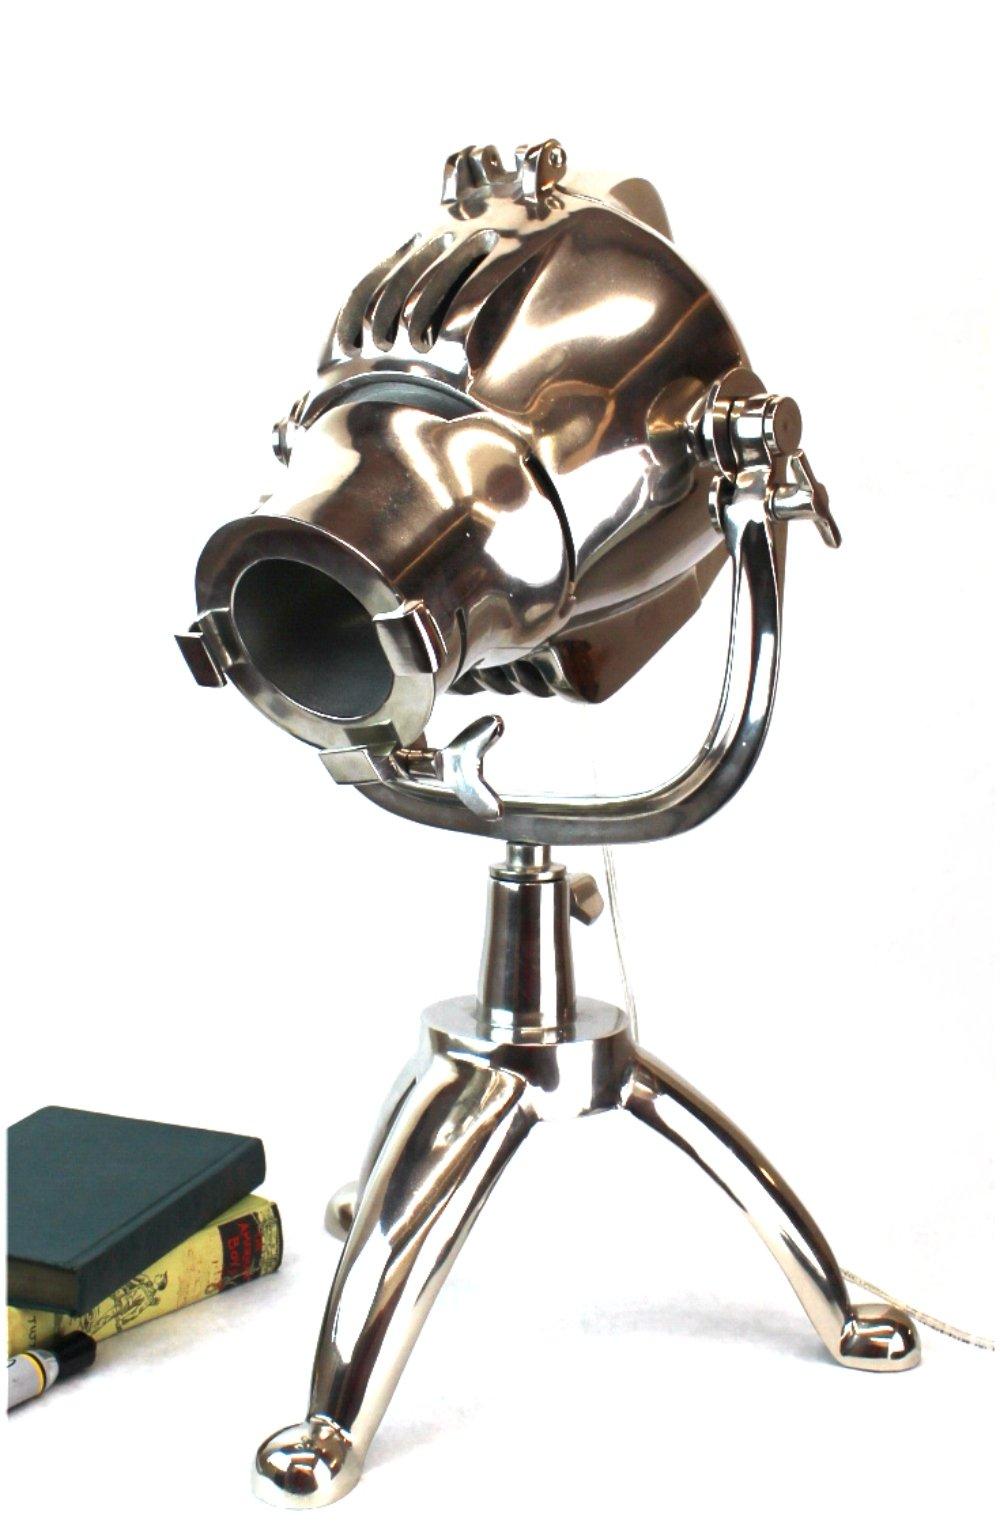 Hollywood Movie Studio Magnified Lens Spot Light Table Desk Lamp Light Fixture